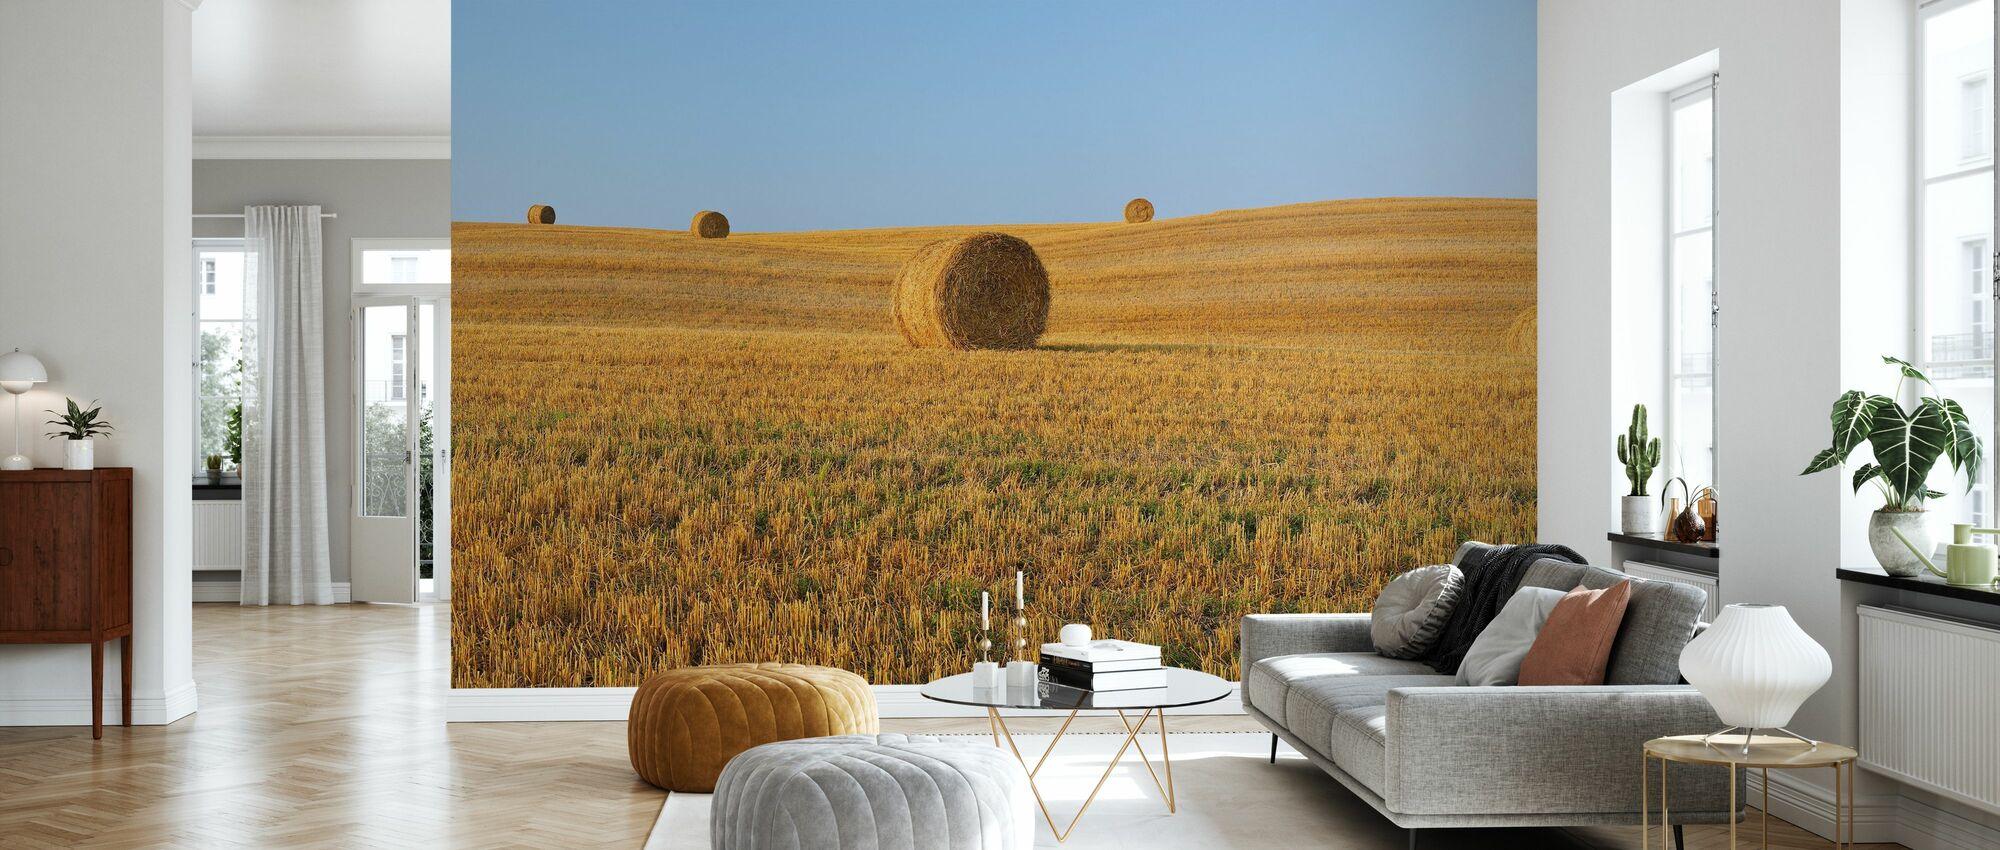 Harvested Wheat Field - Wallpaper - Living Room